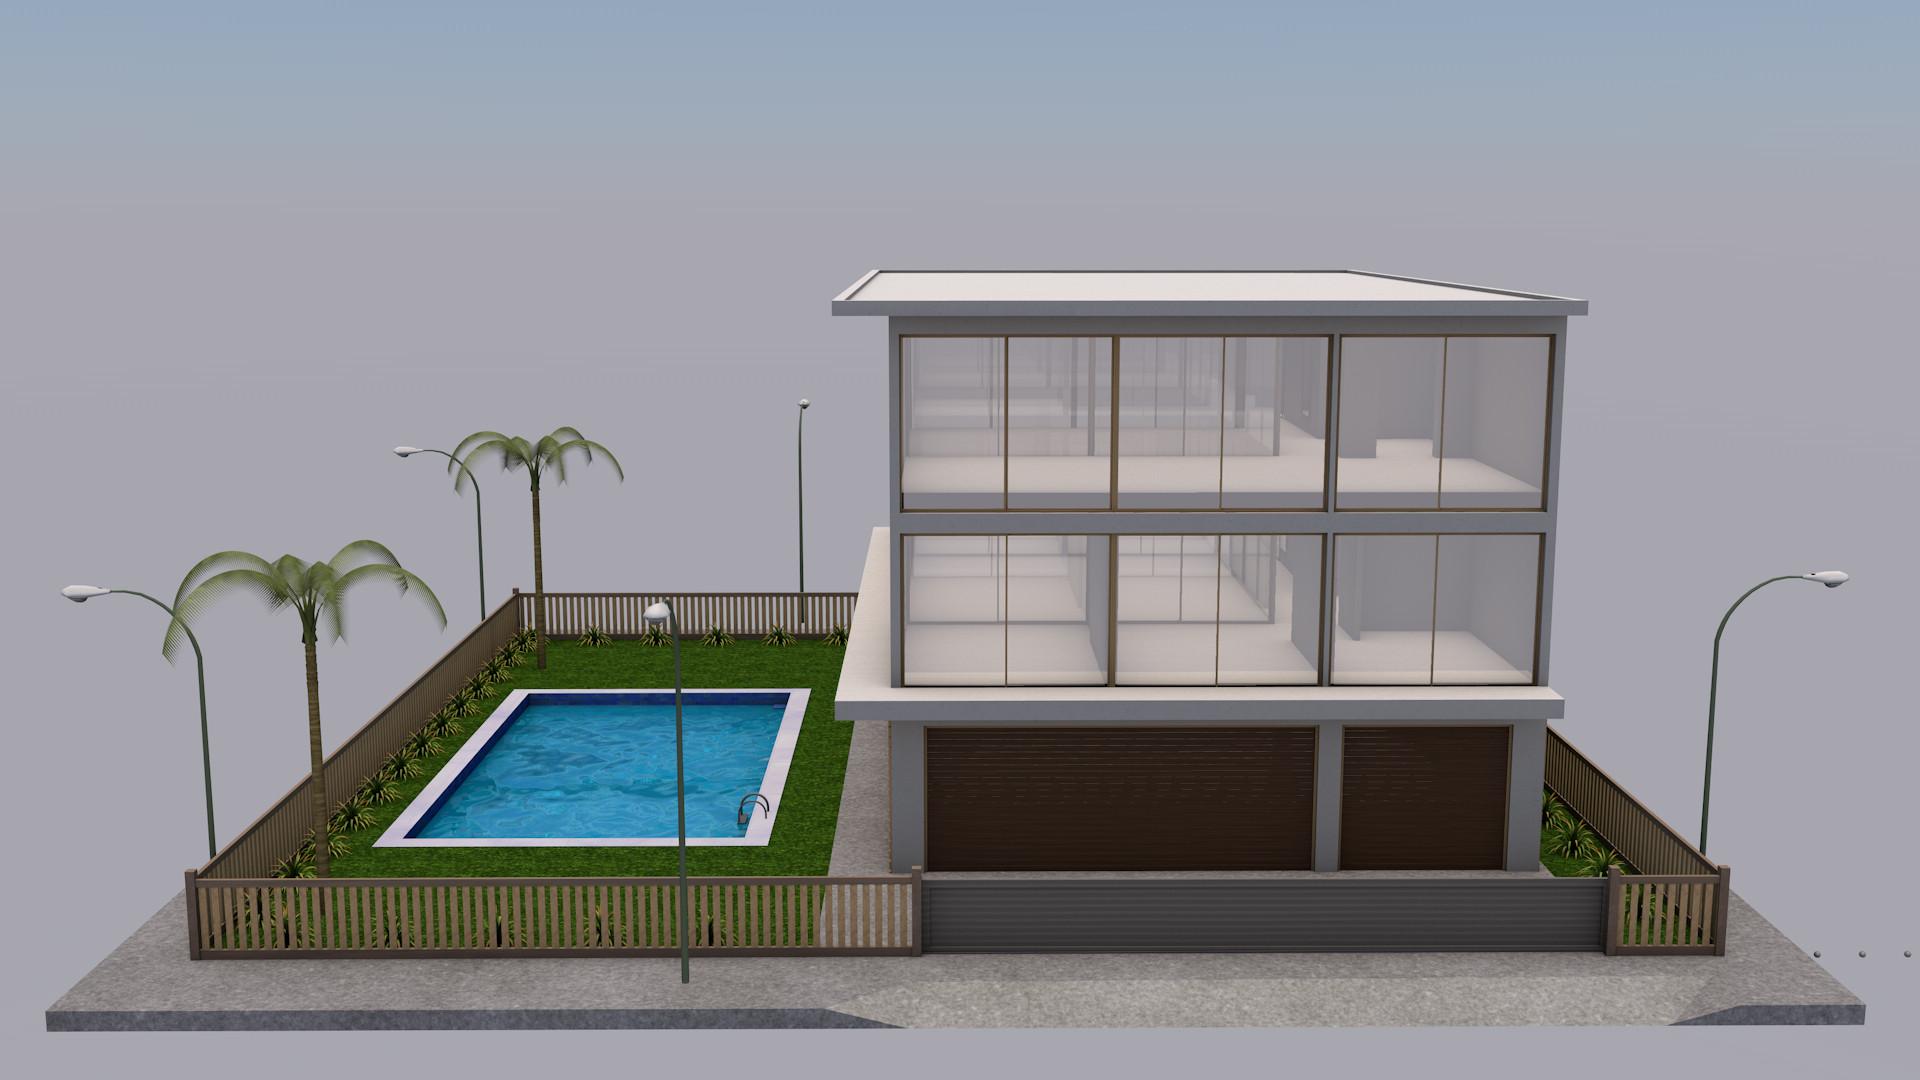 luxury modern house c4d